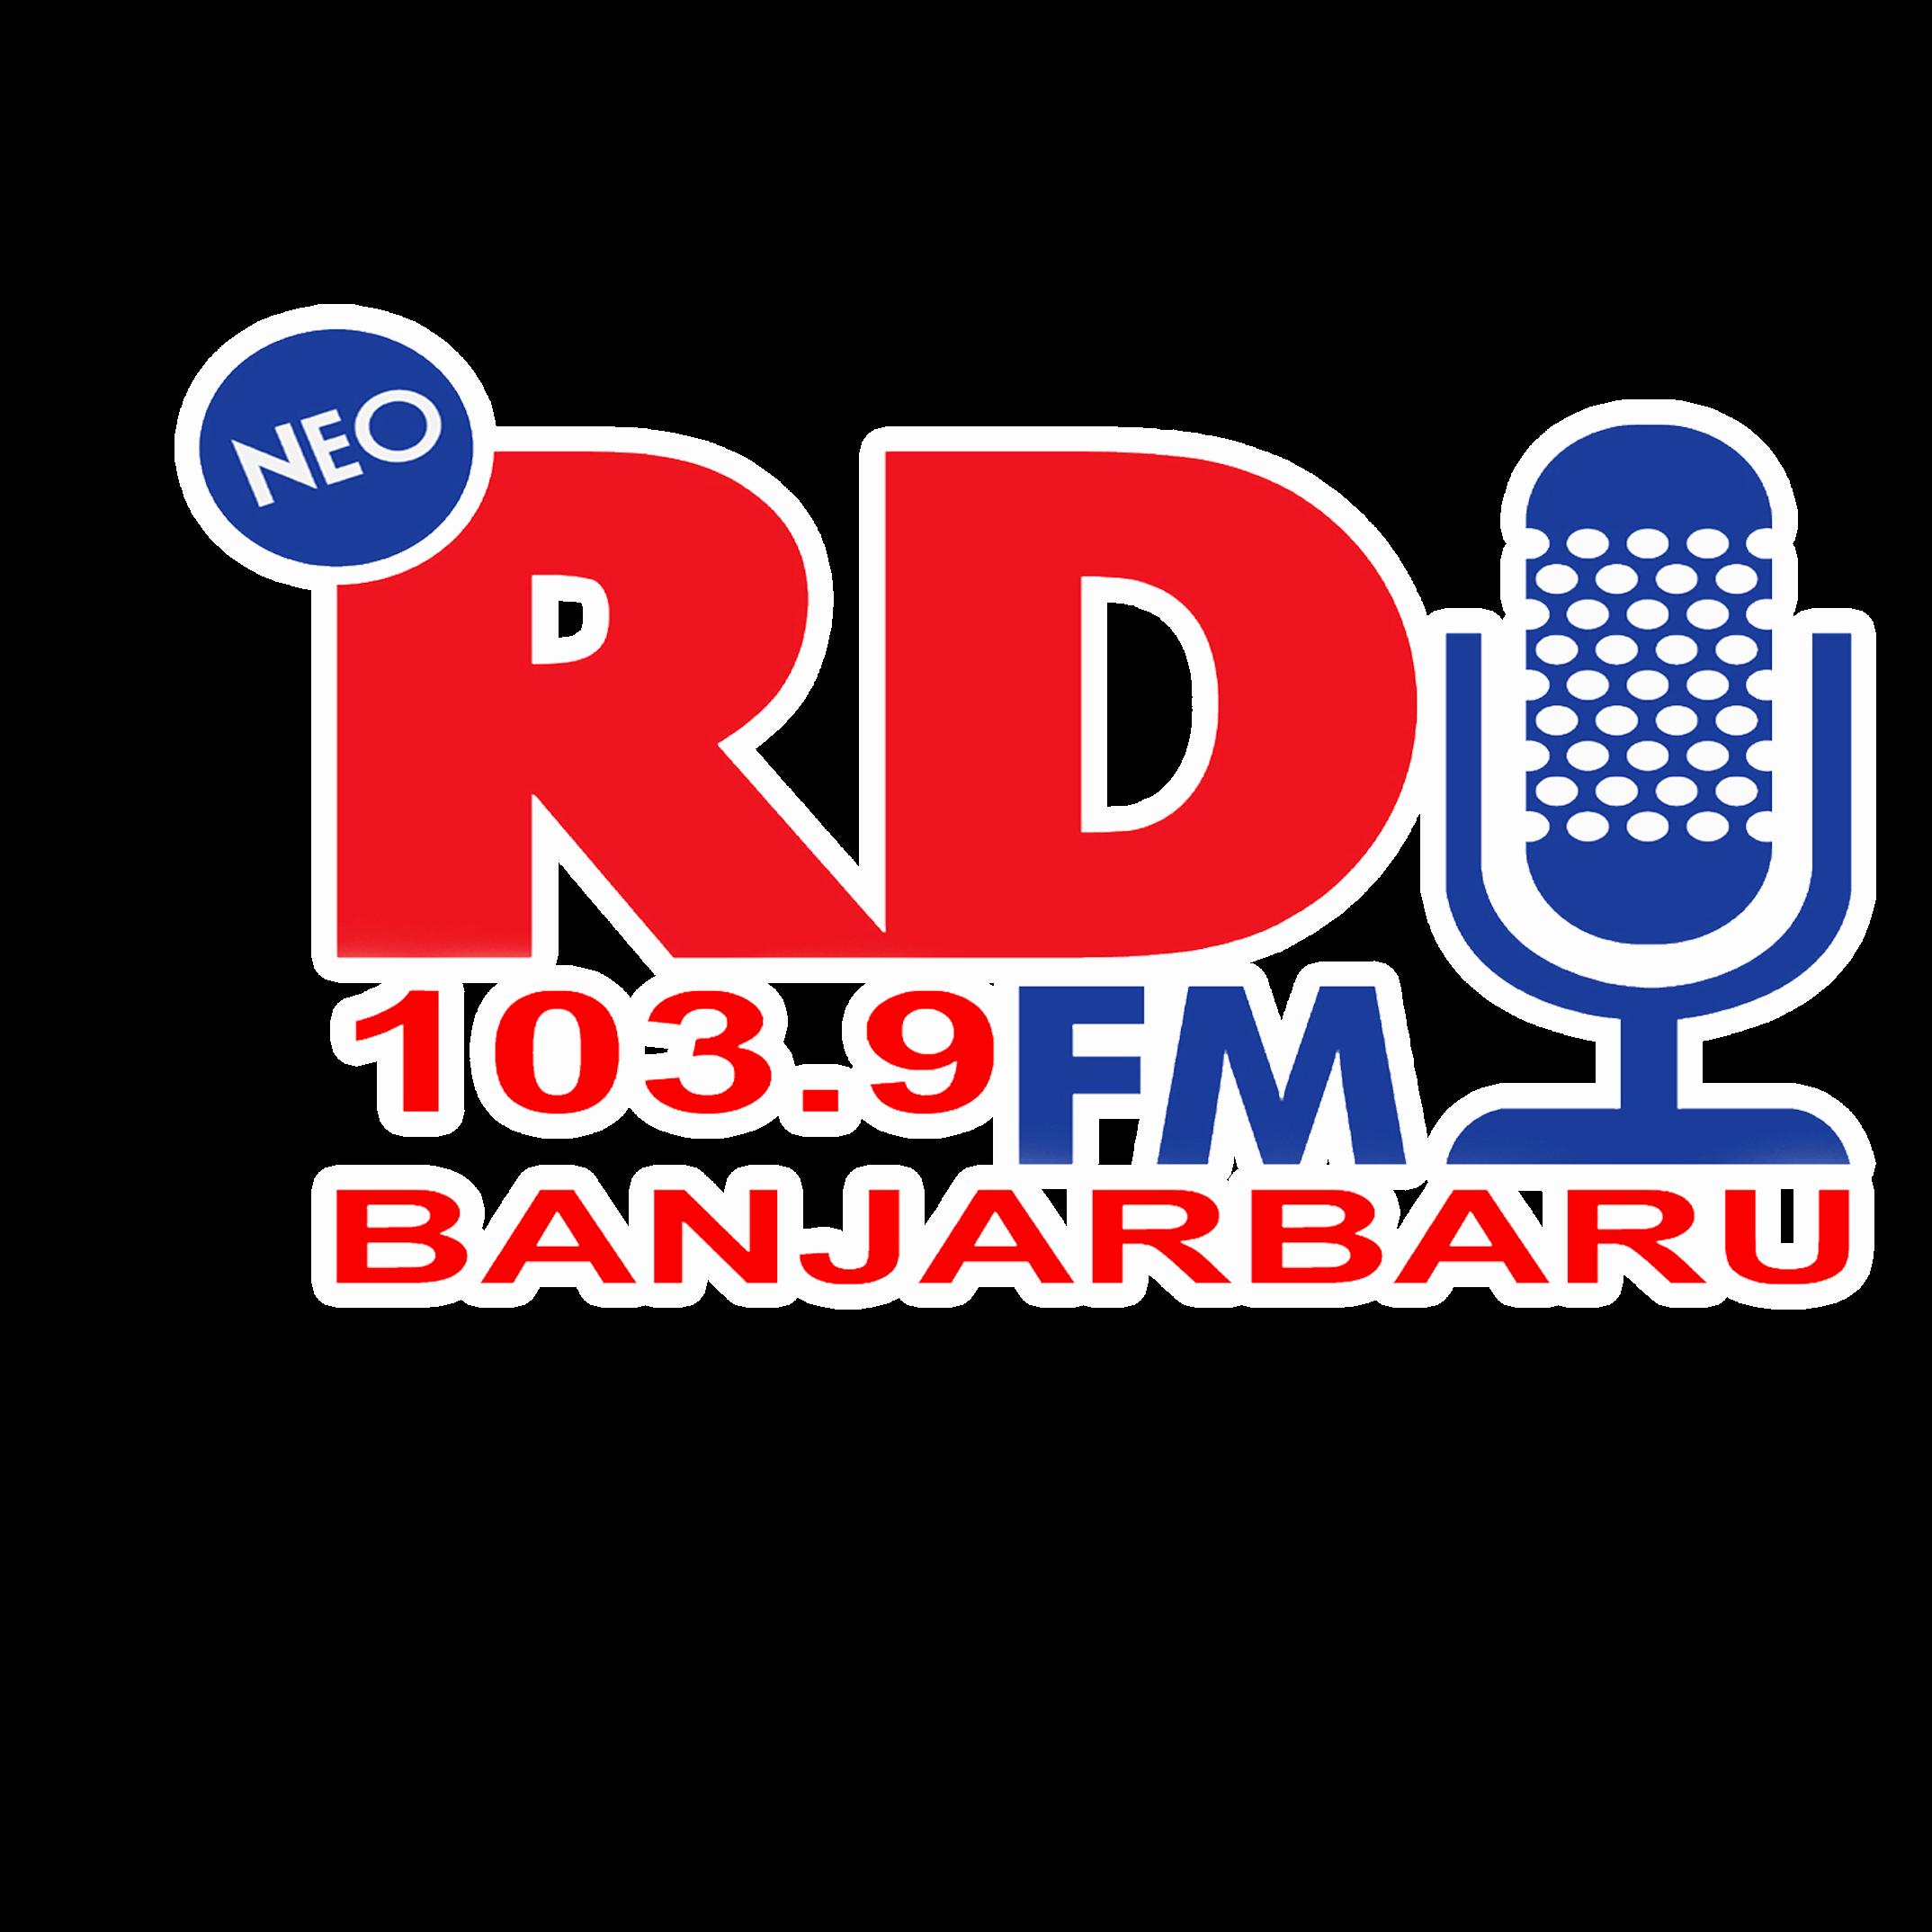 BBM NETWORK RADIO BANJARBARU